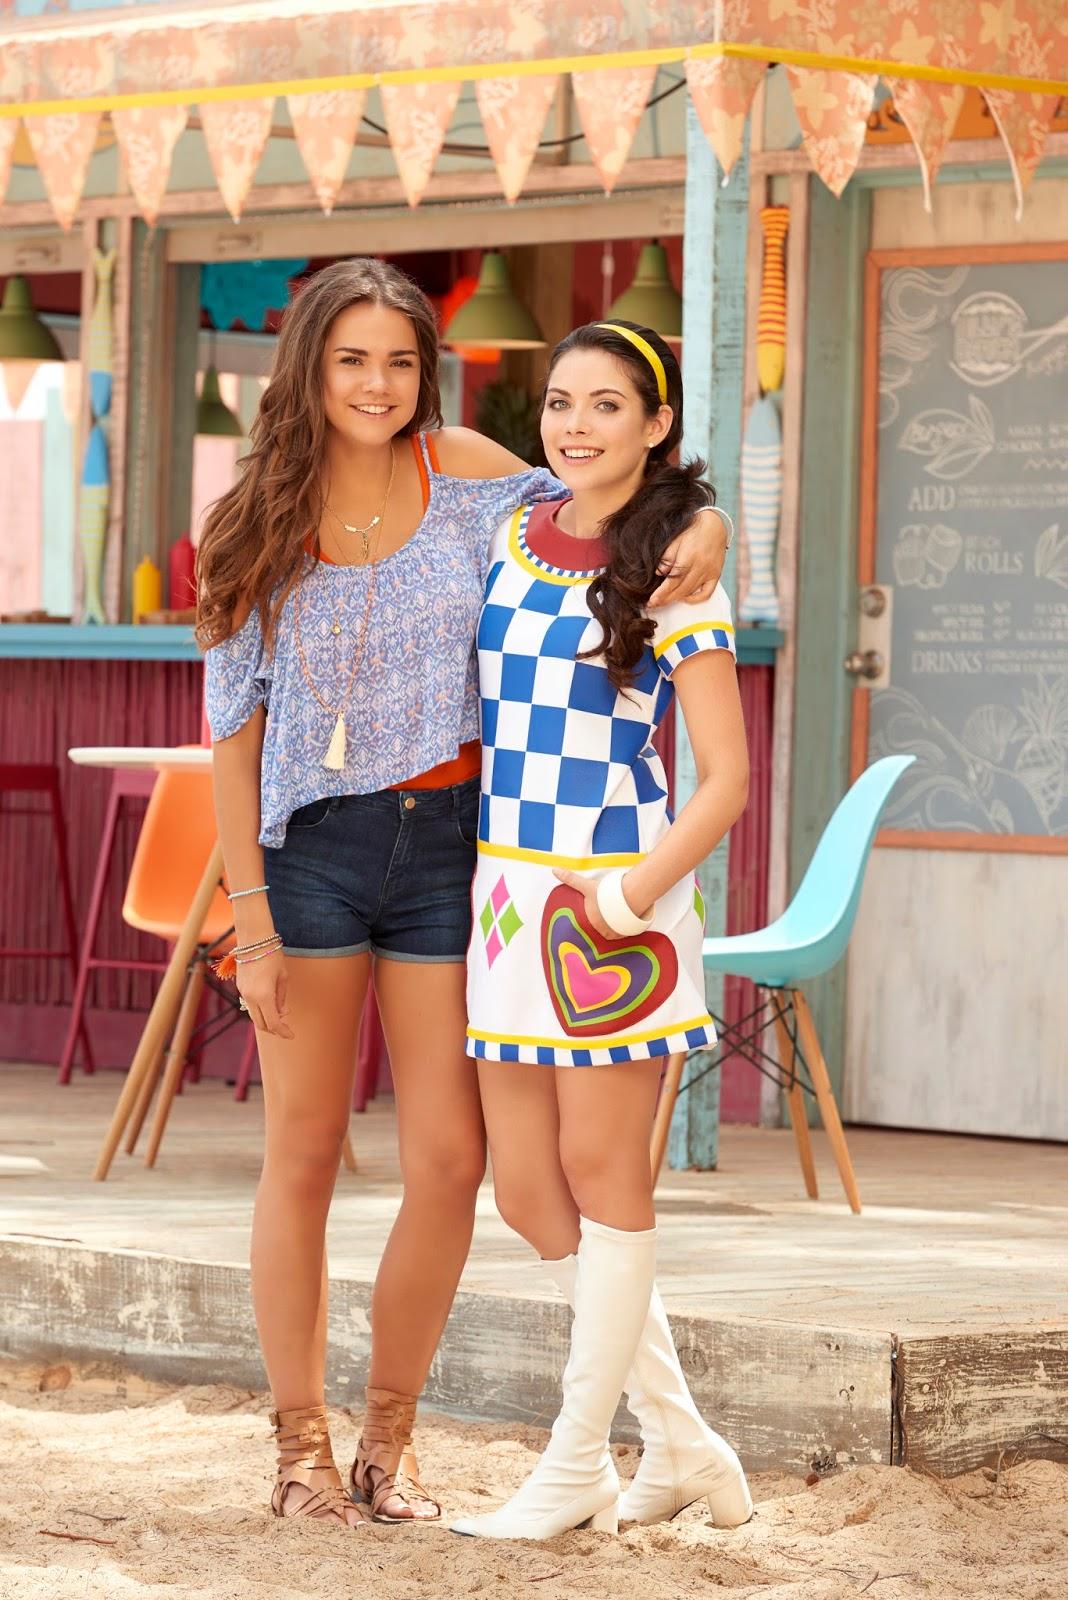 Hot teen beach movie girls — 2